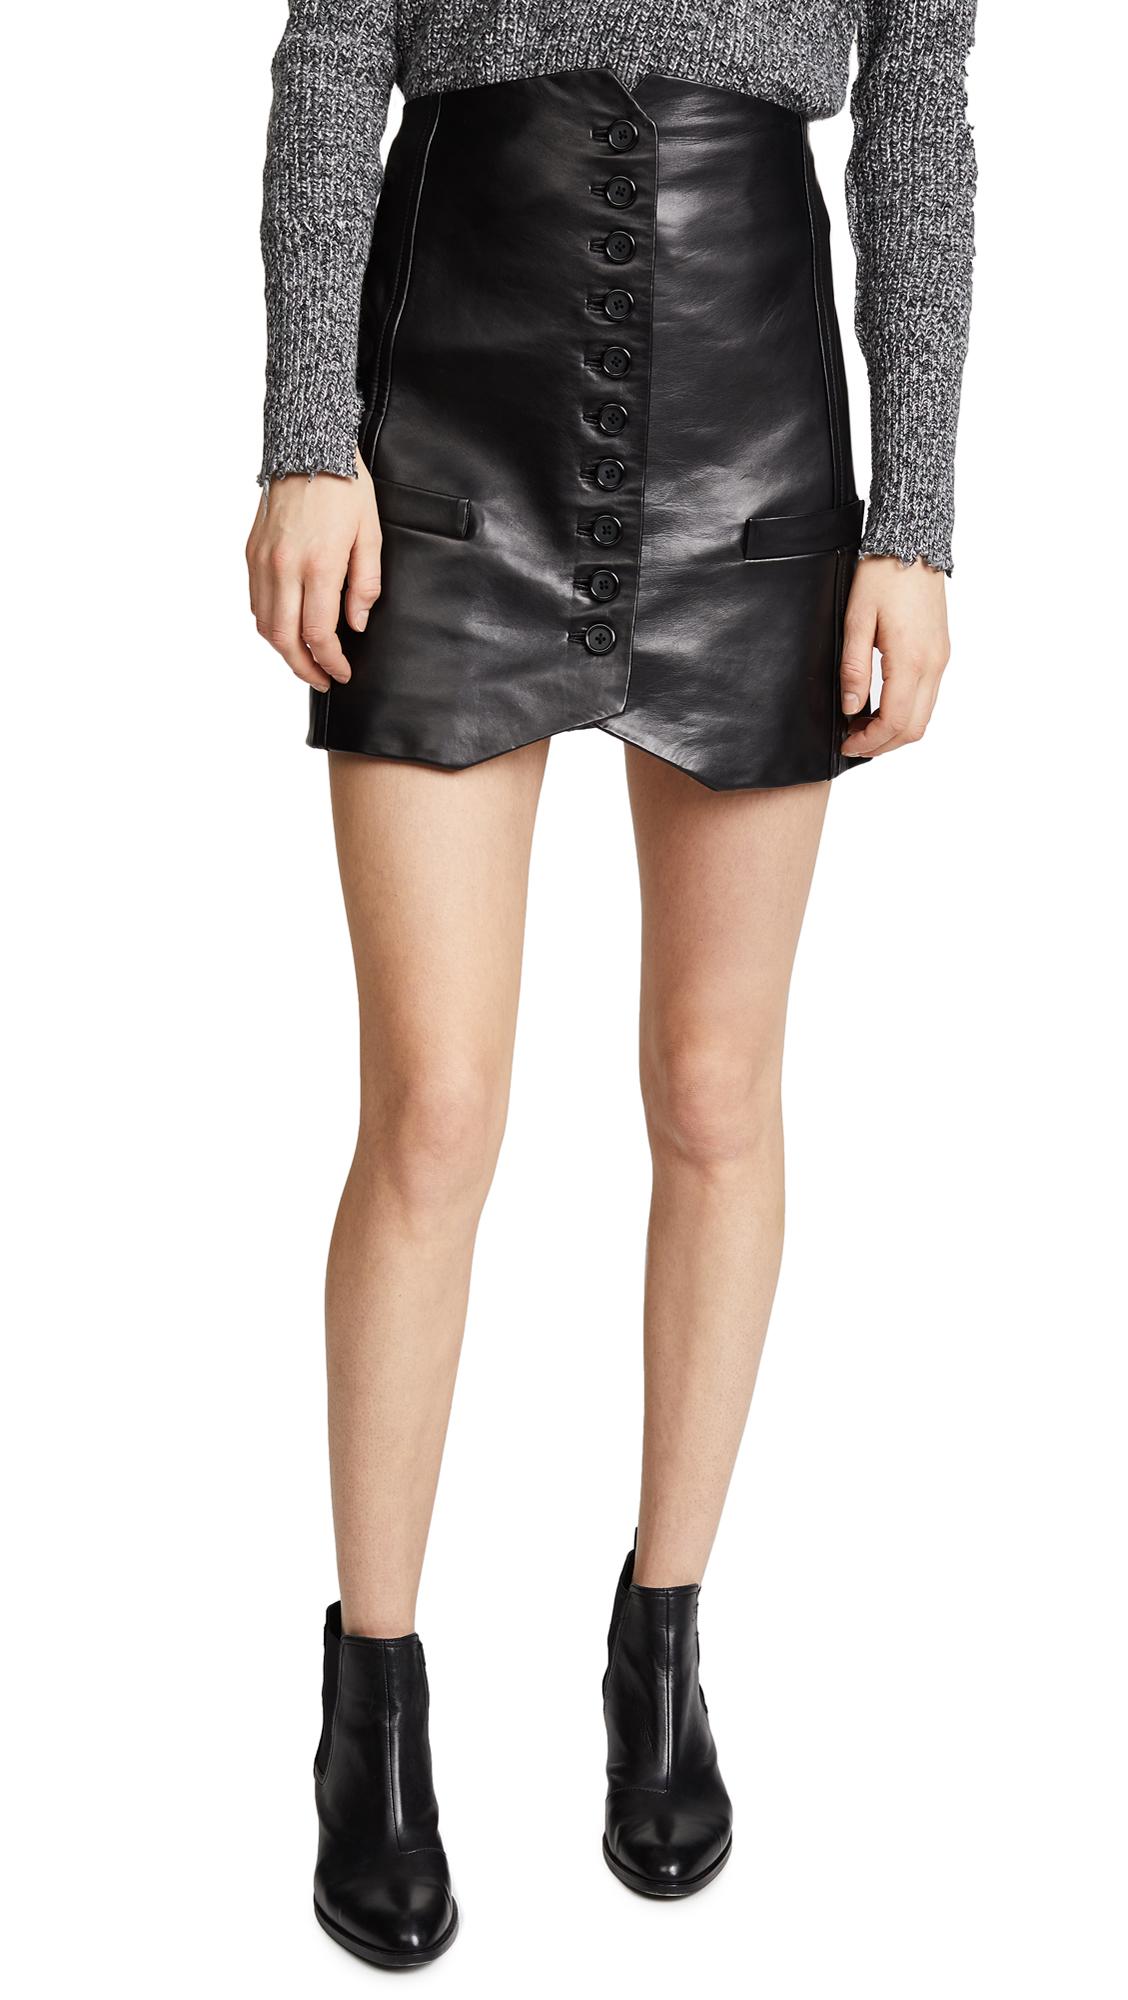 Helmut Lang Leather Vest Skirt - Black